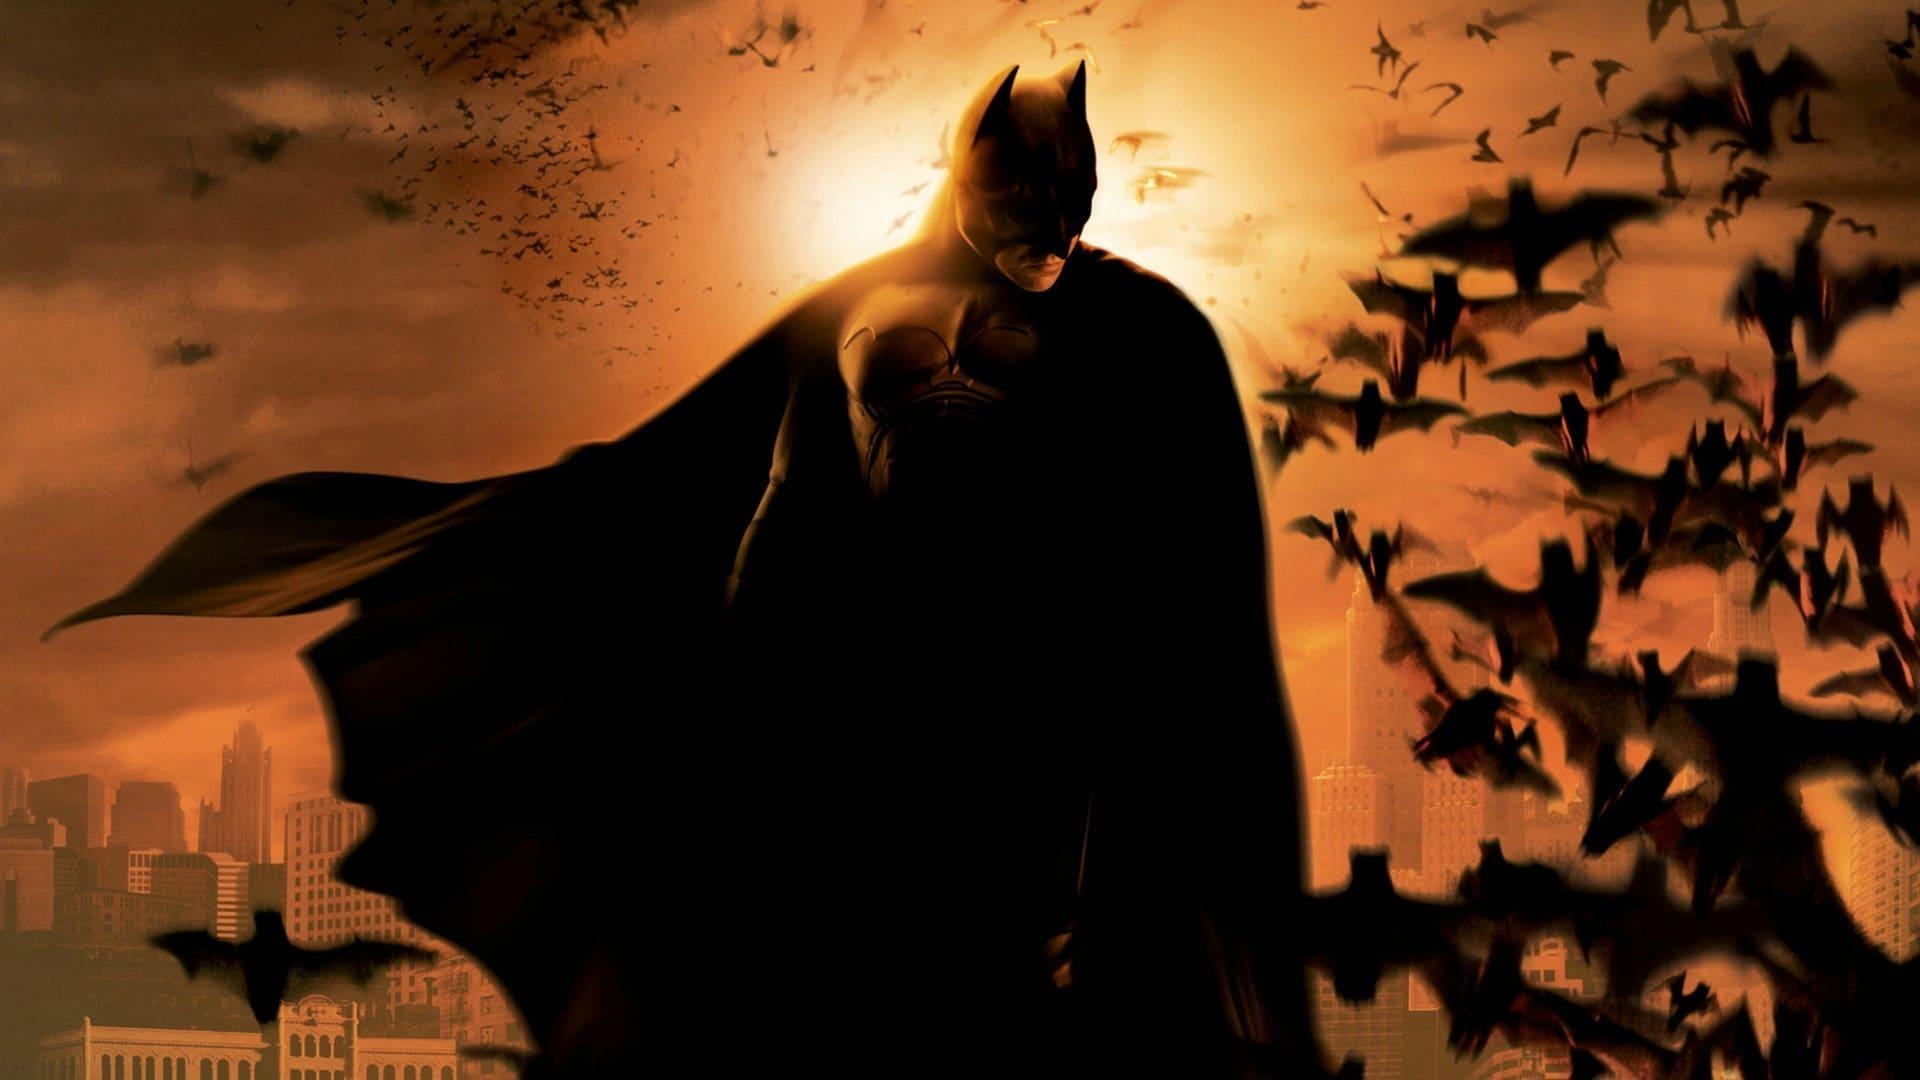 The Impact Of Christopher Nolan Batman Begins On Modern Cinema